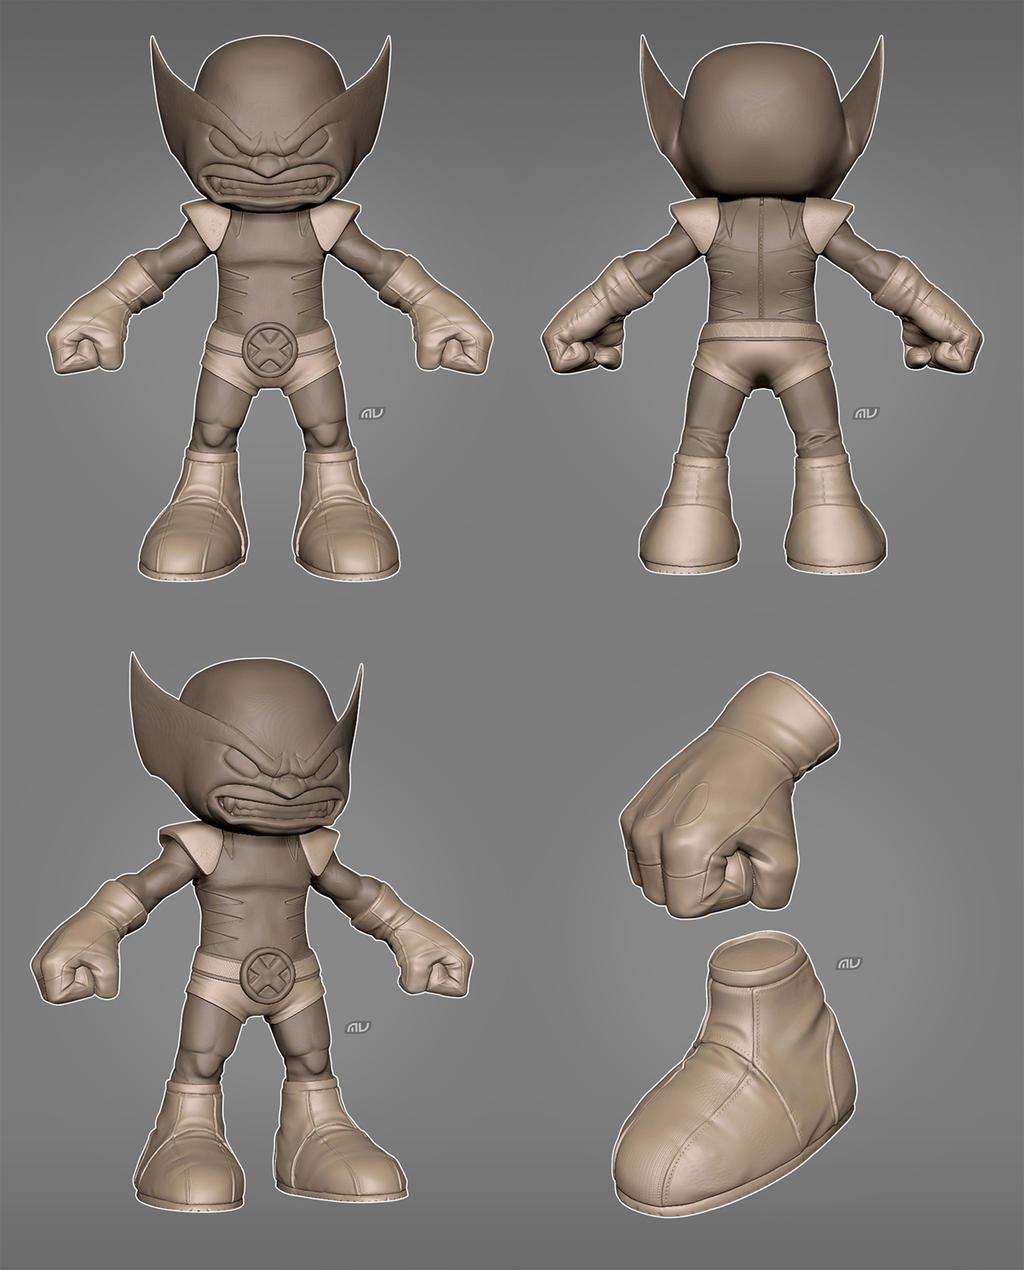 Wolverine Big Head Figure - 3DTotal Forums